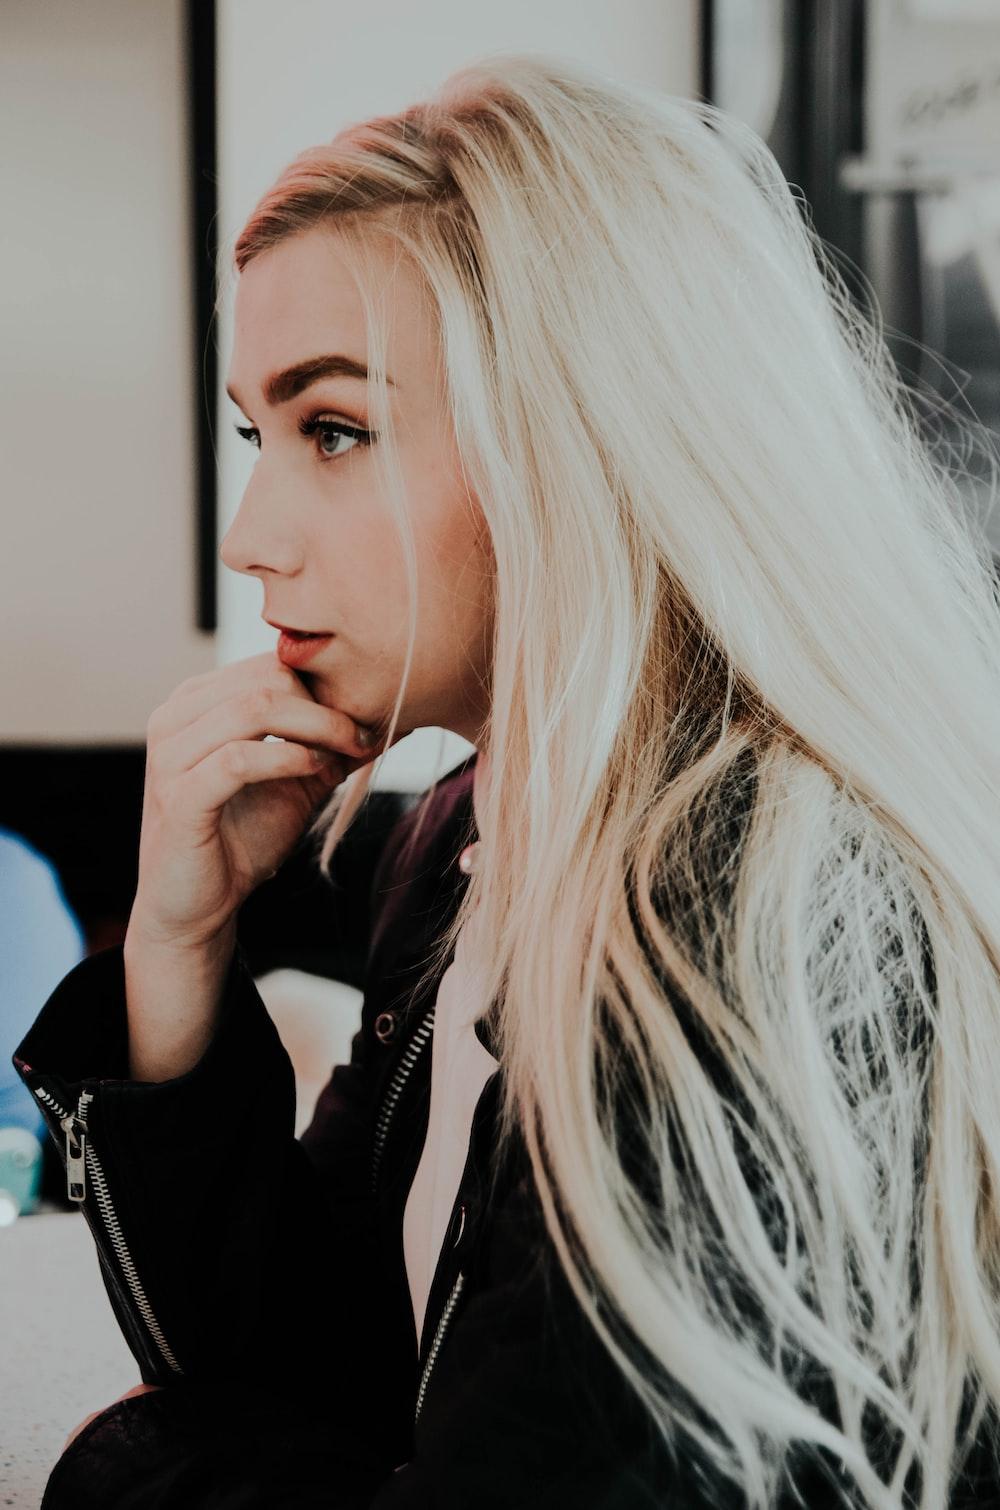 beige hair woman wearing black jacket